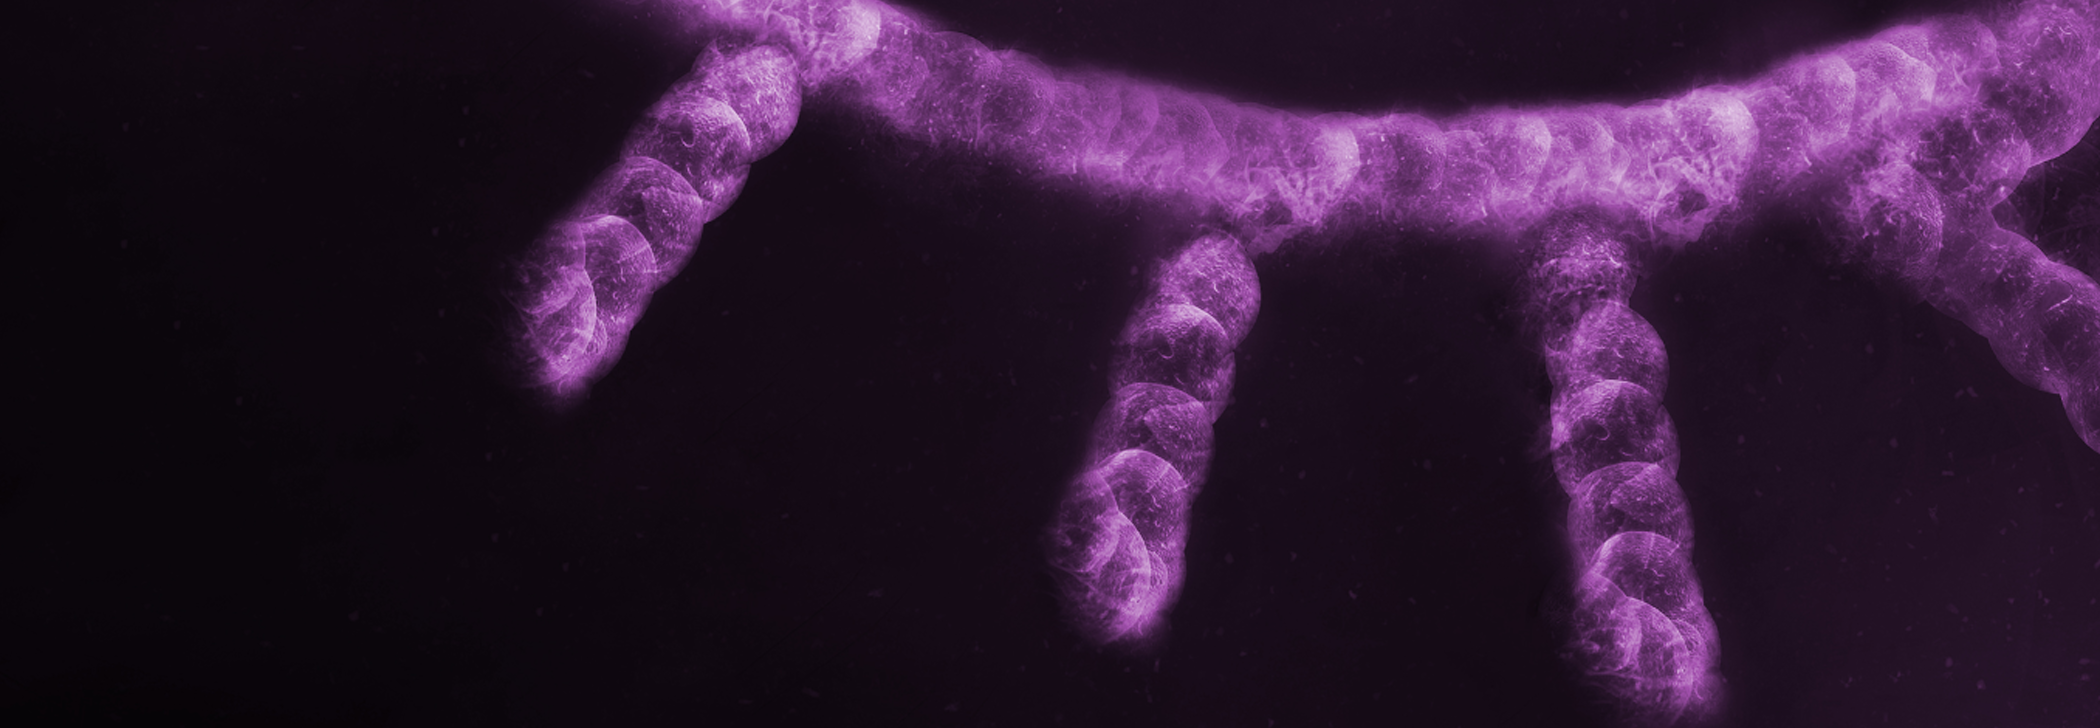 Almac Diagnostic Services RNA panel solution